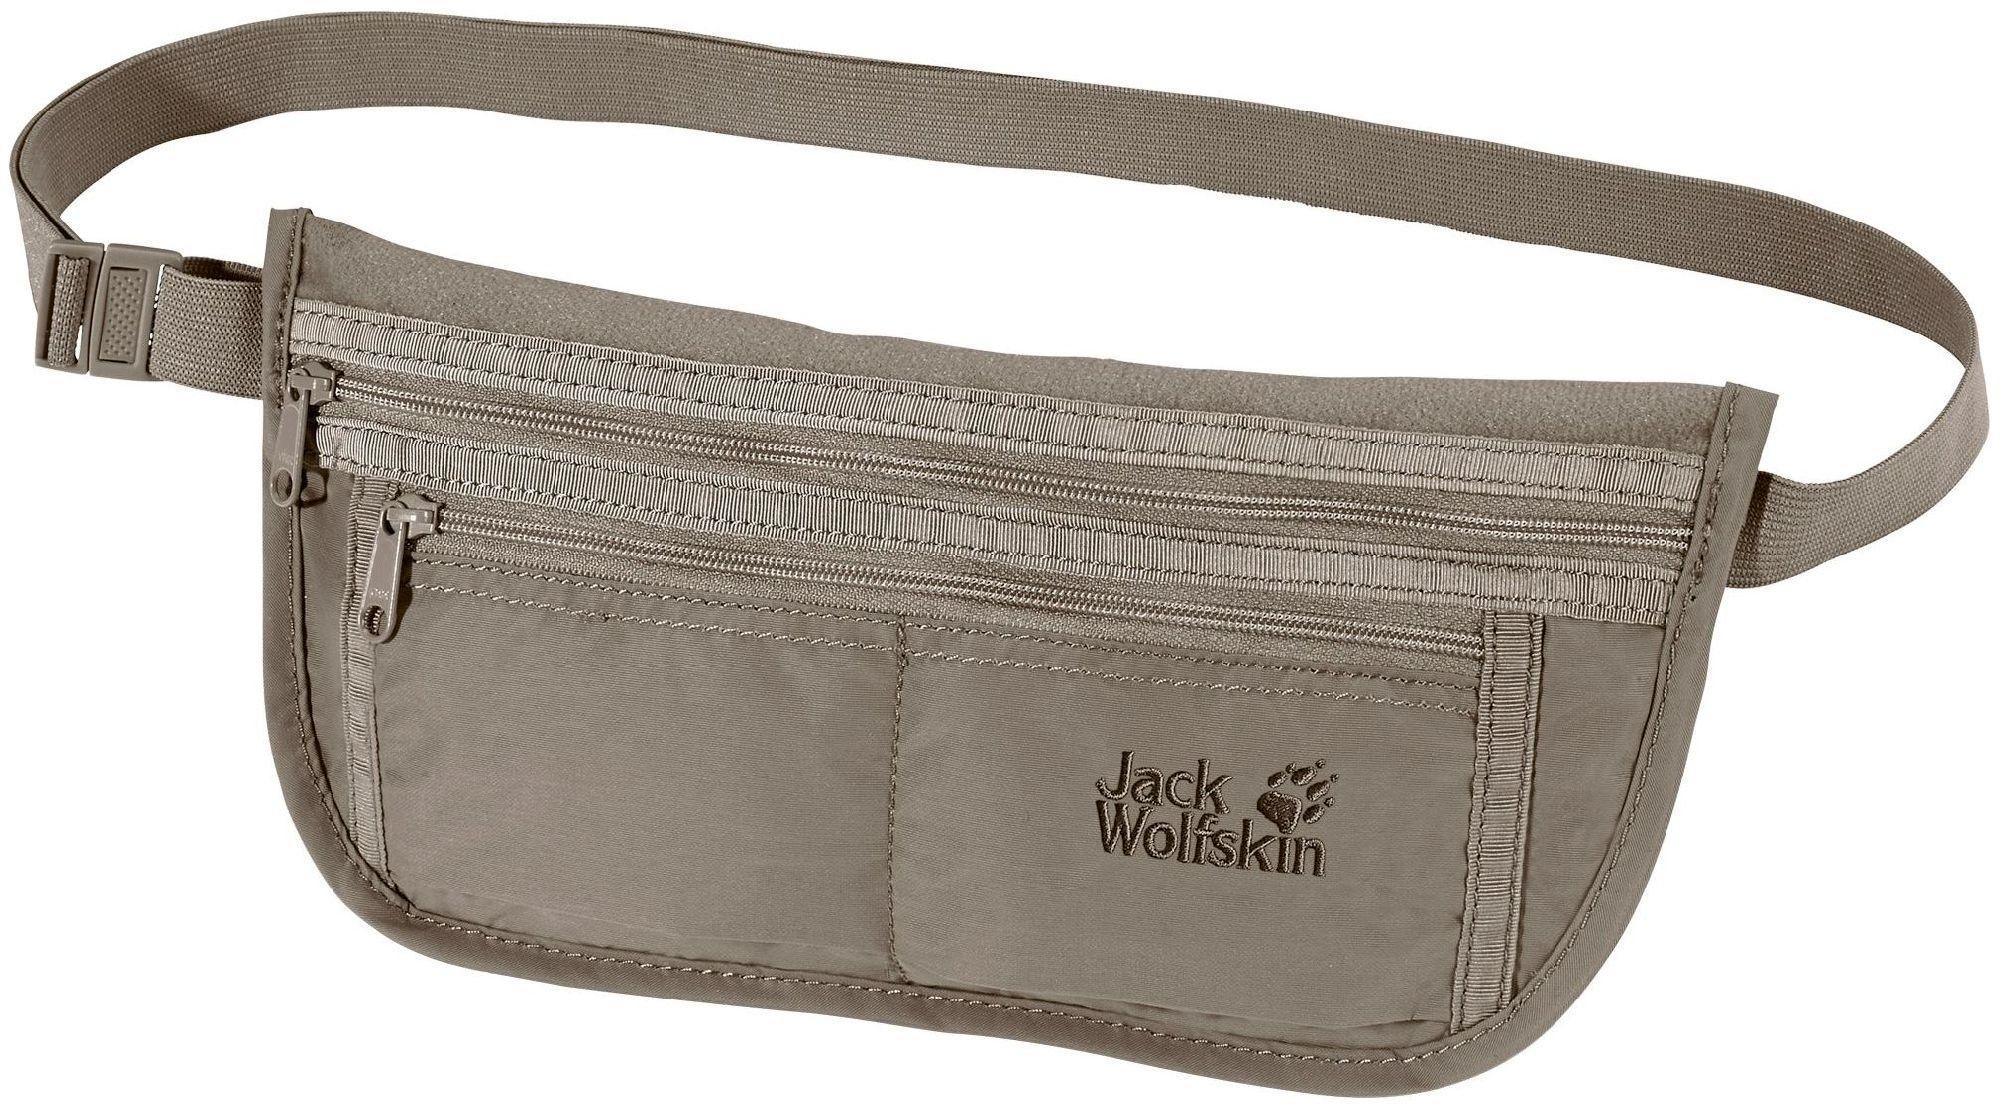 Jack Wolfskin Saszetka Document Belt (84370-590)